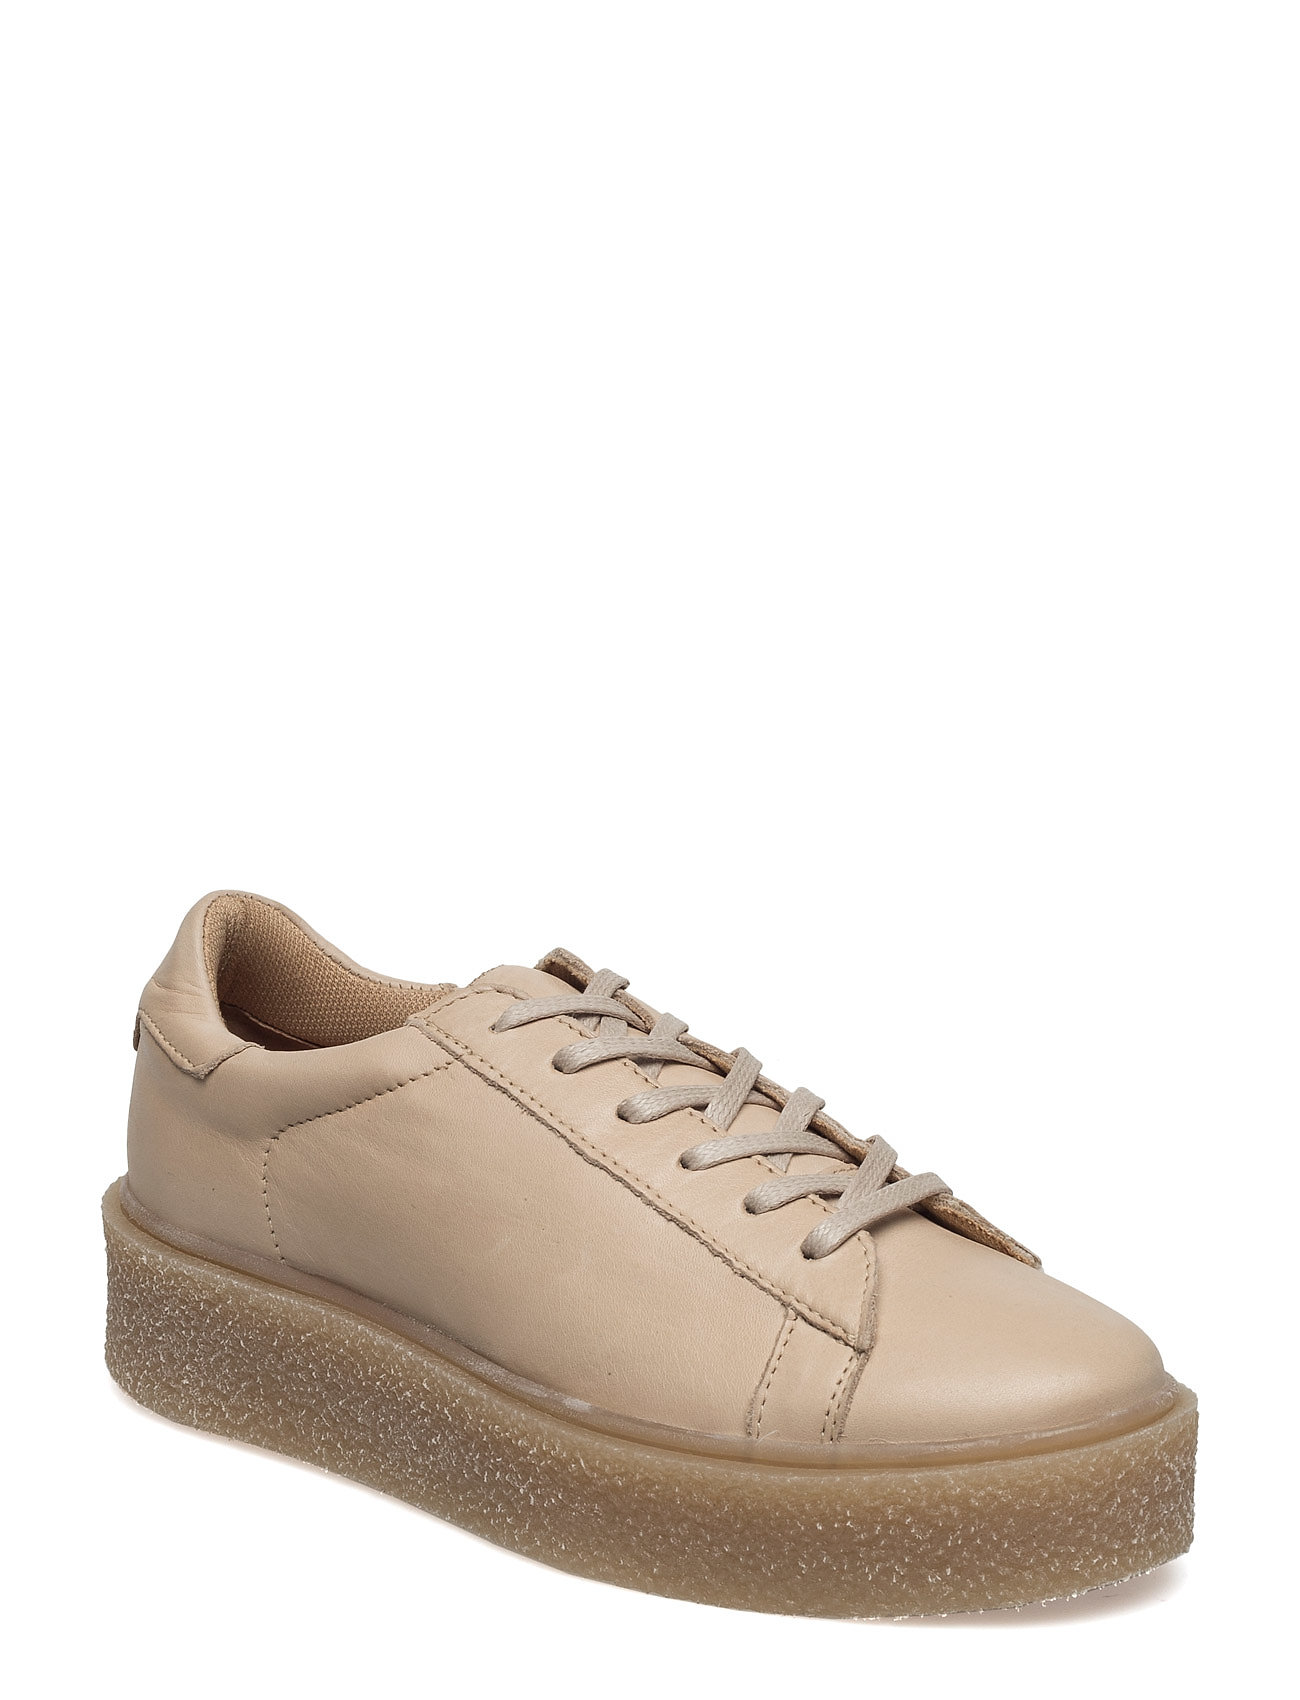 Chunky Plim Shoe Jfm17 Bianco Sneakers til Damer i SAND